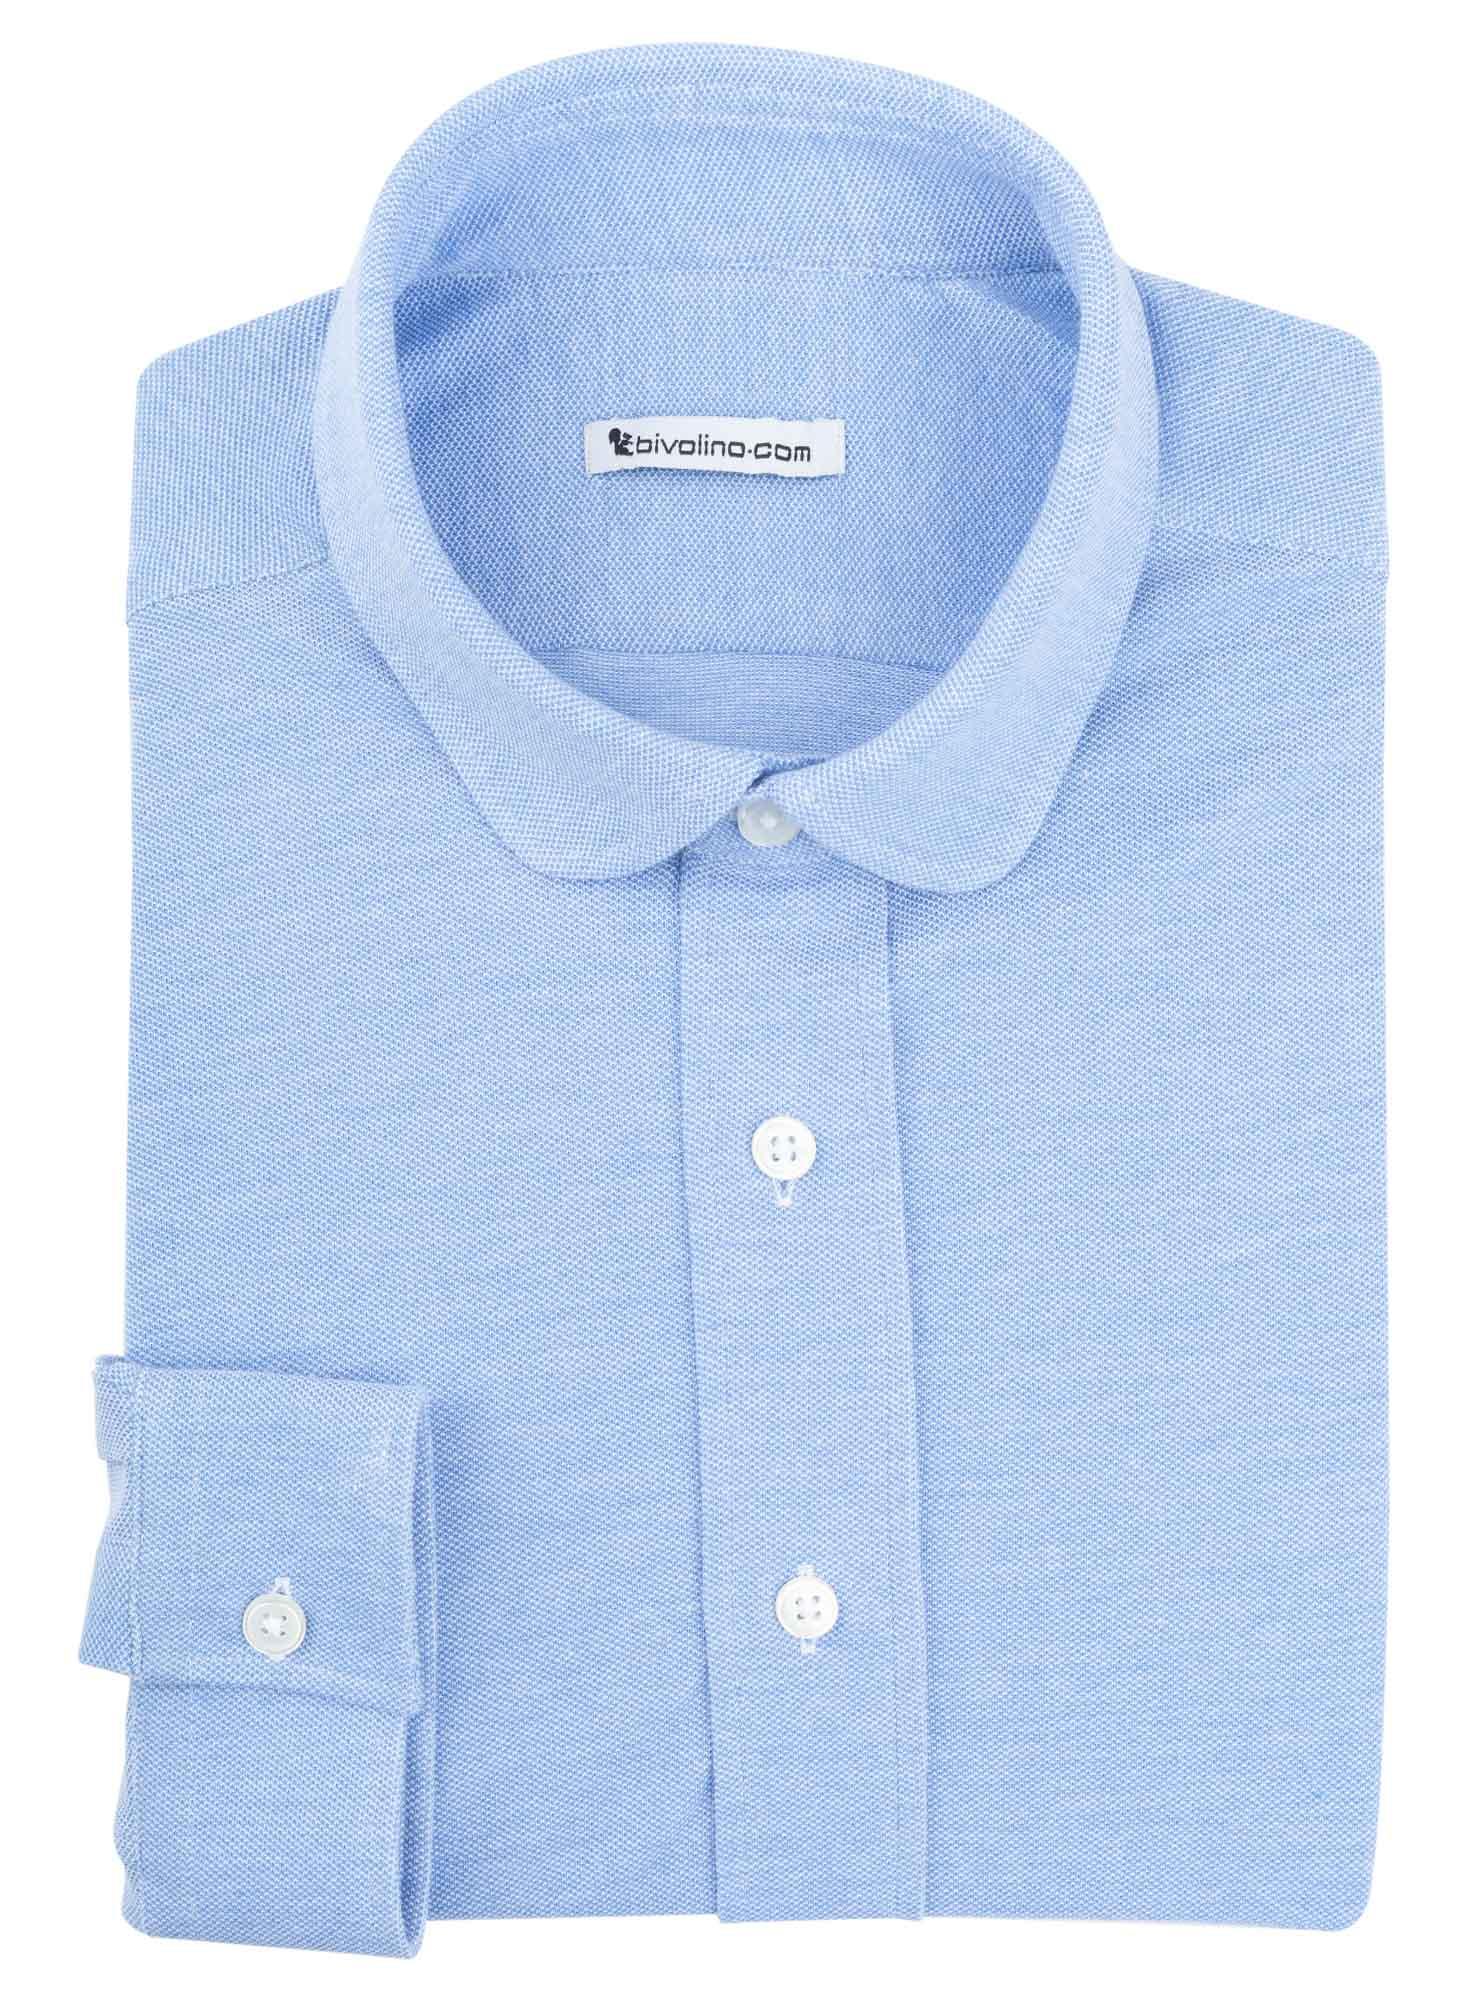 JERSILOINI - 100% coton piqué Jersey blanc  JERSILI 2